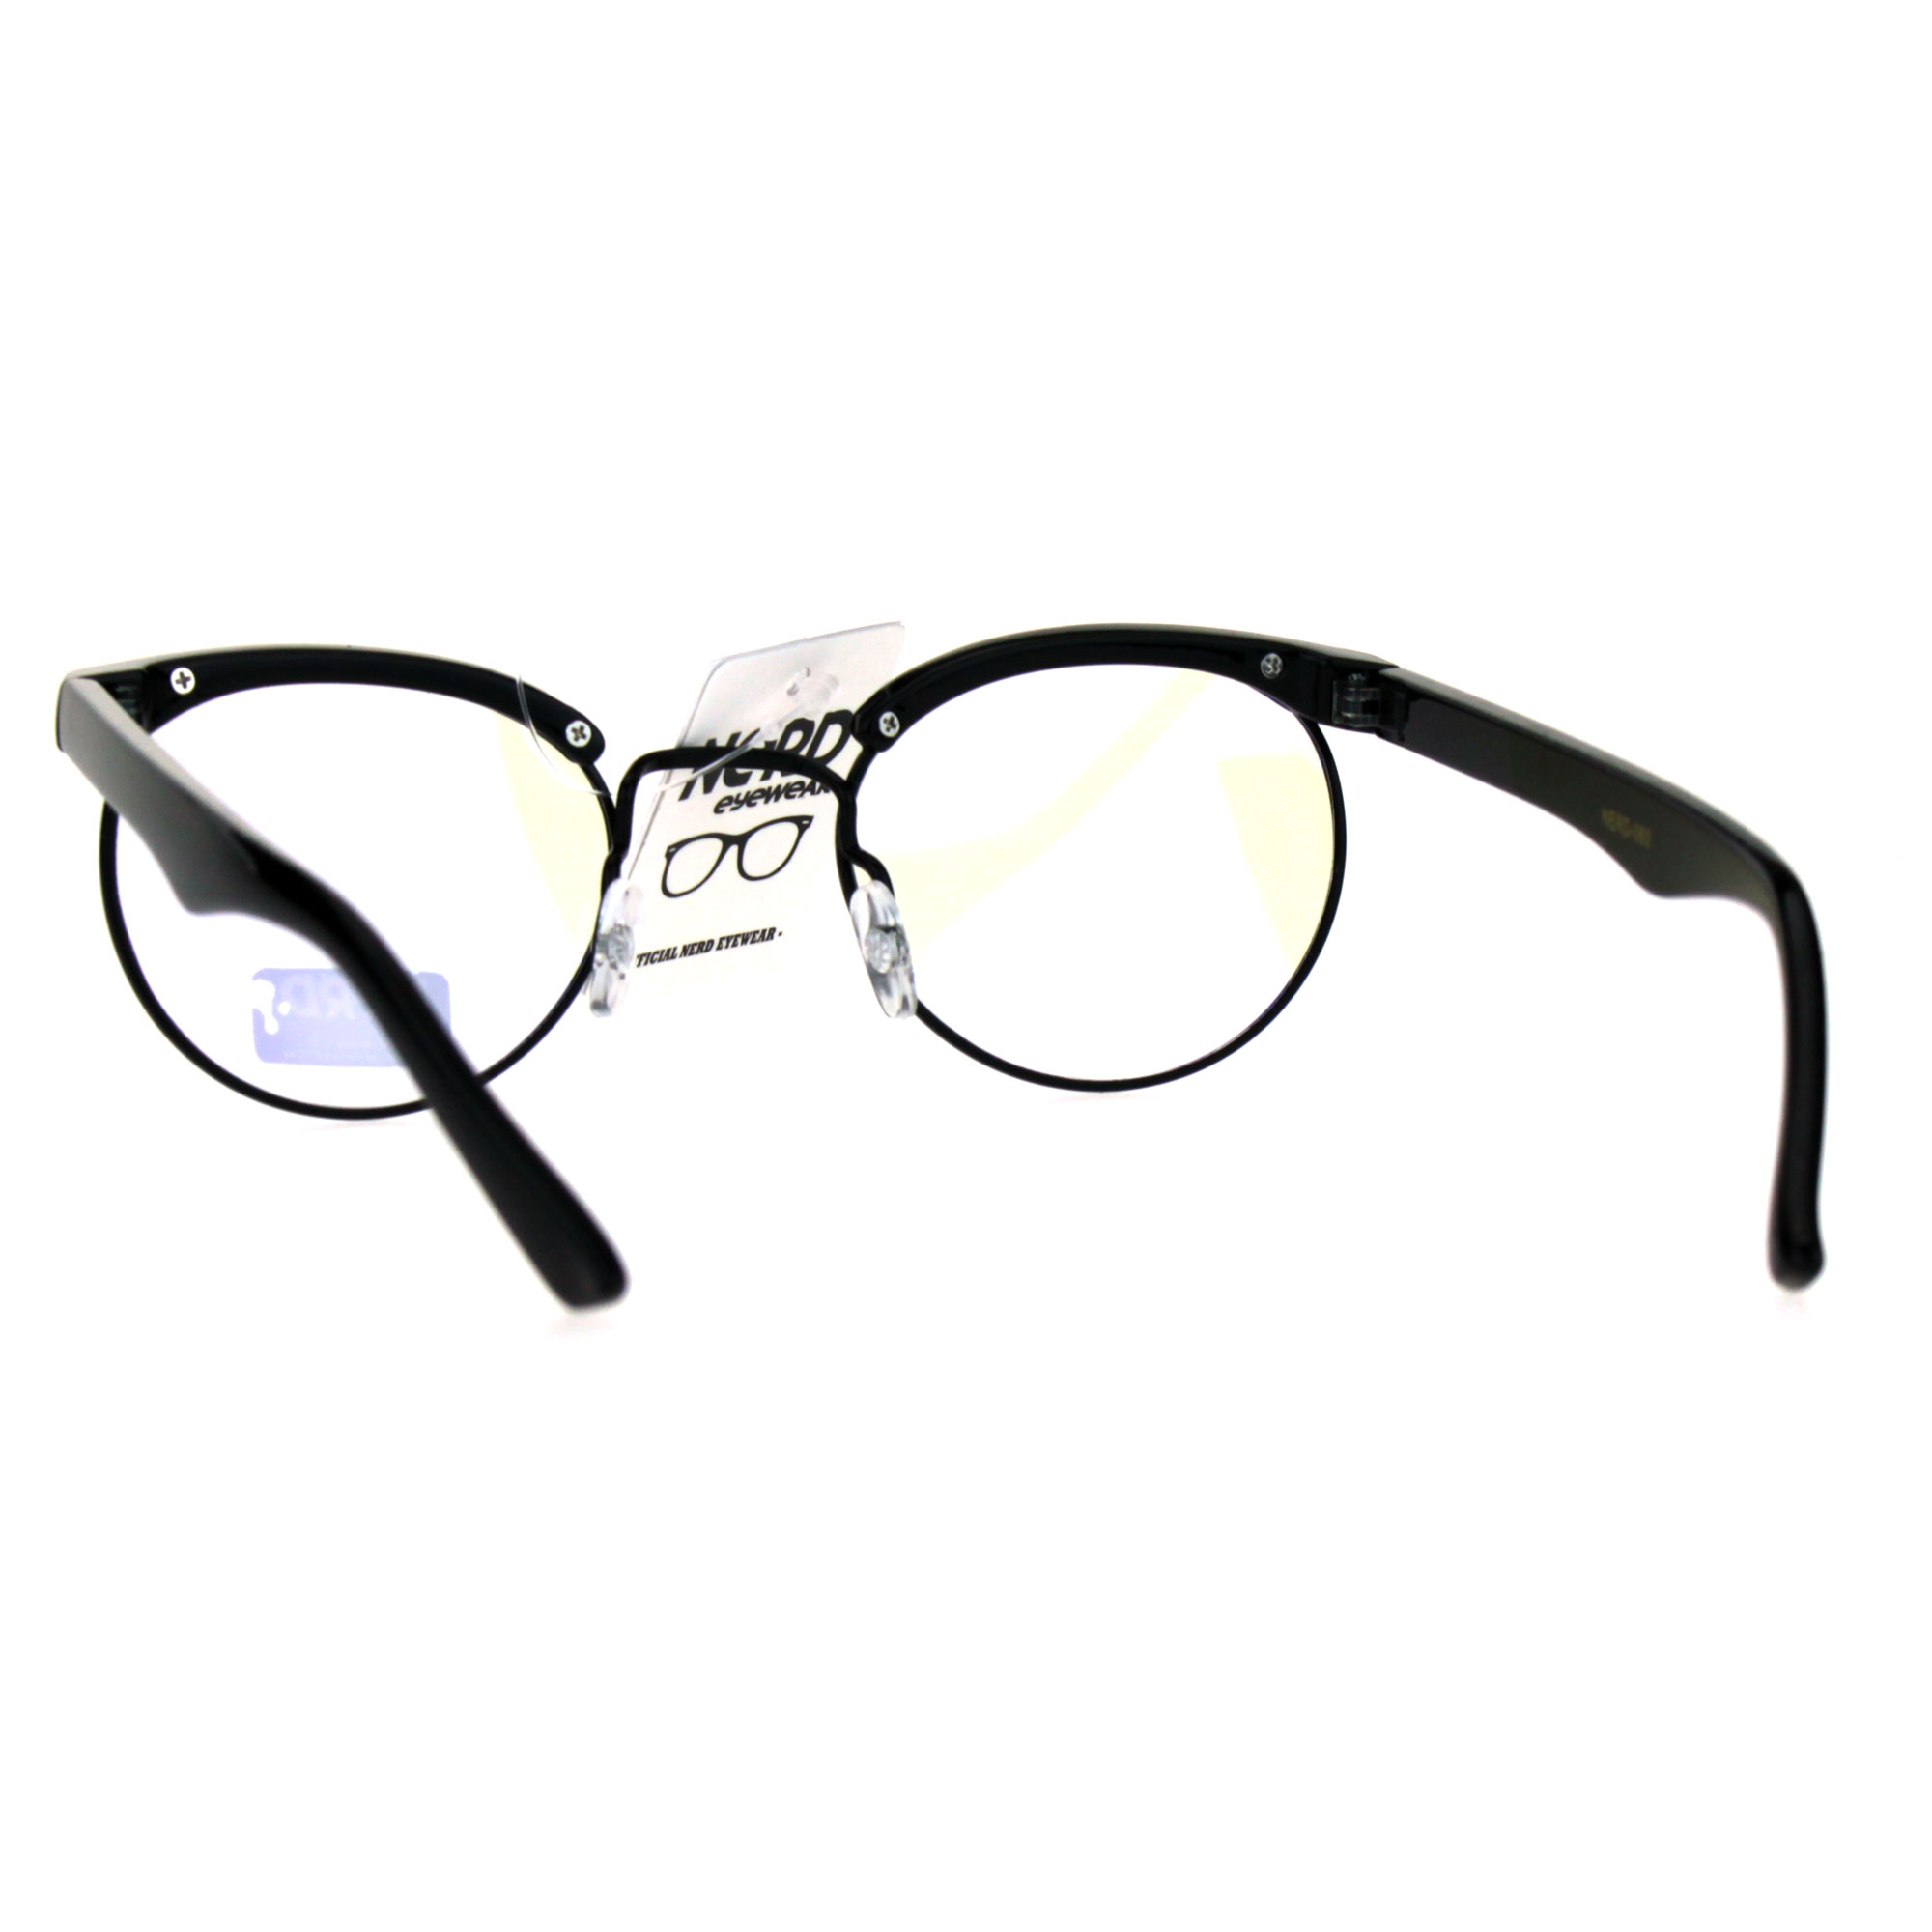 115965fda68 Retro Vintage Classic Half Rim Round Oval Clear Lens Eye Glasses